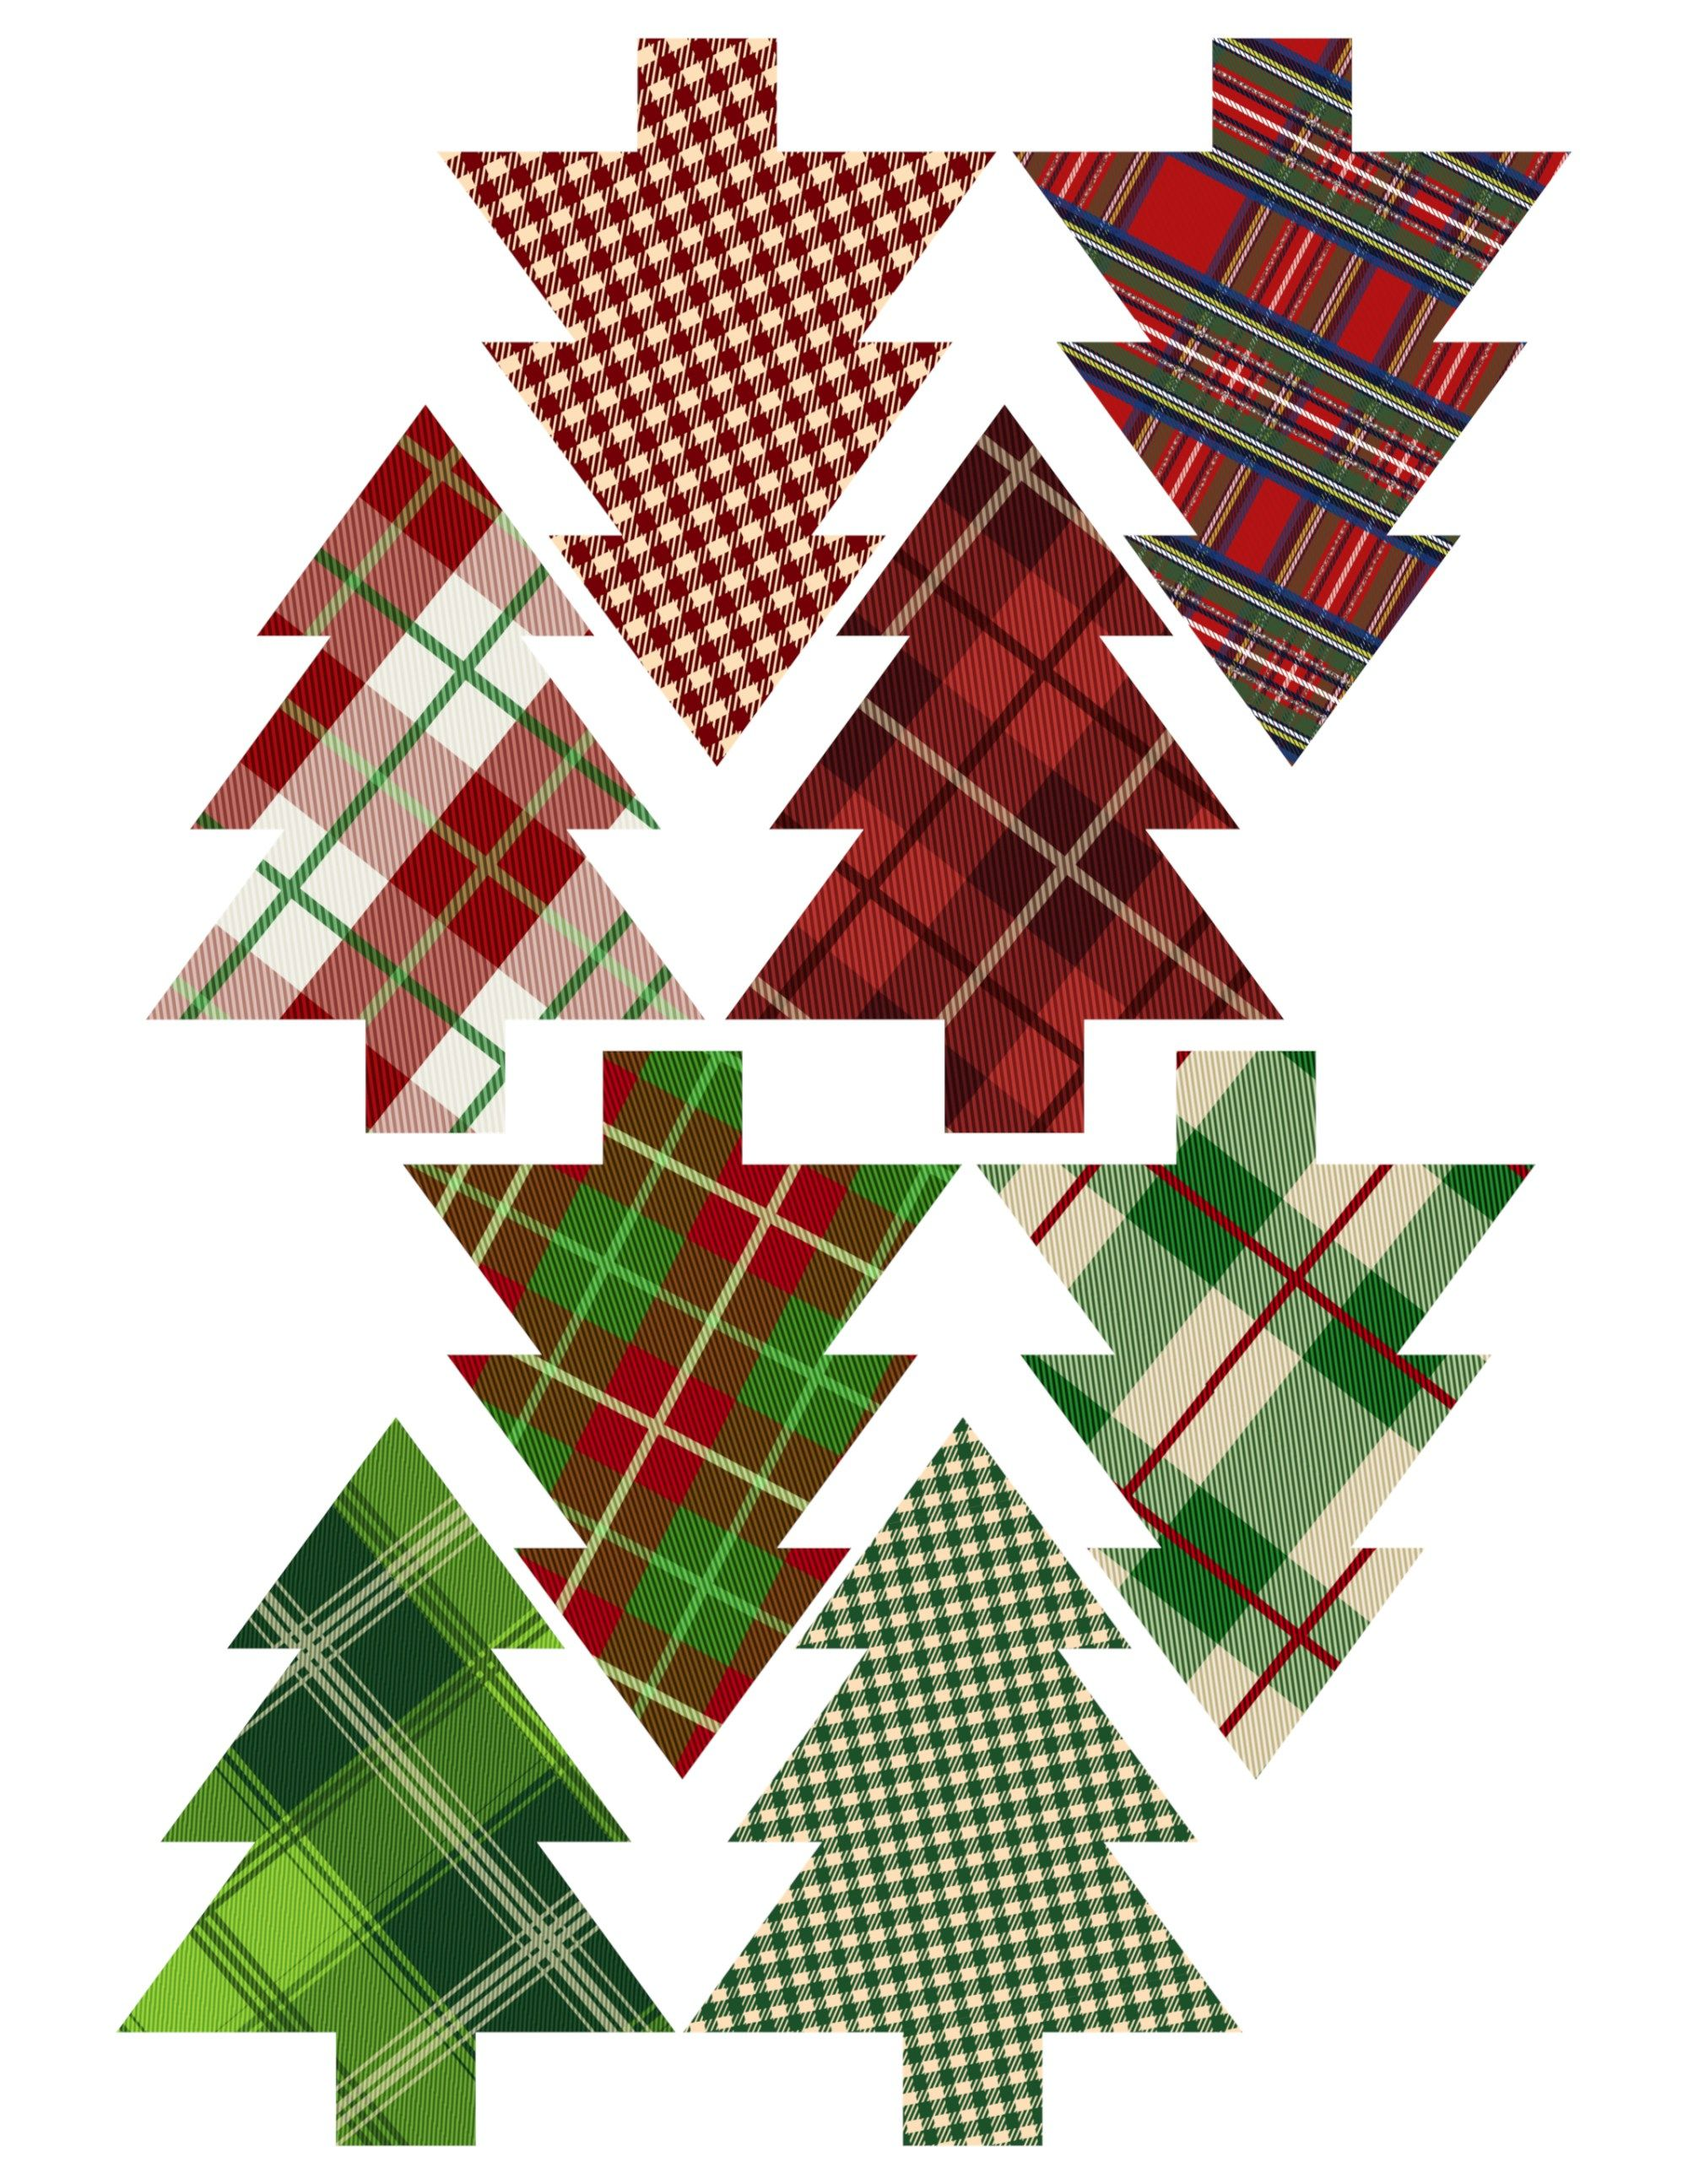 Plaid Christmas Tree Ornaments Printable Easy Ornament Craft DIY Set Of Trees